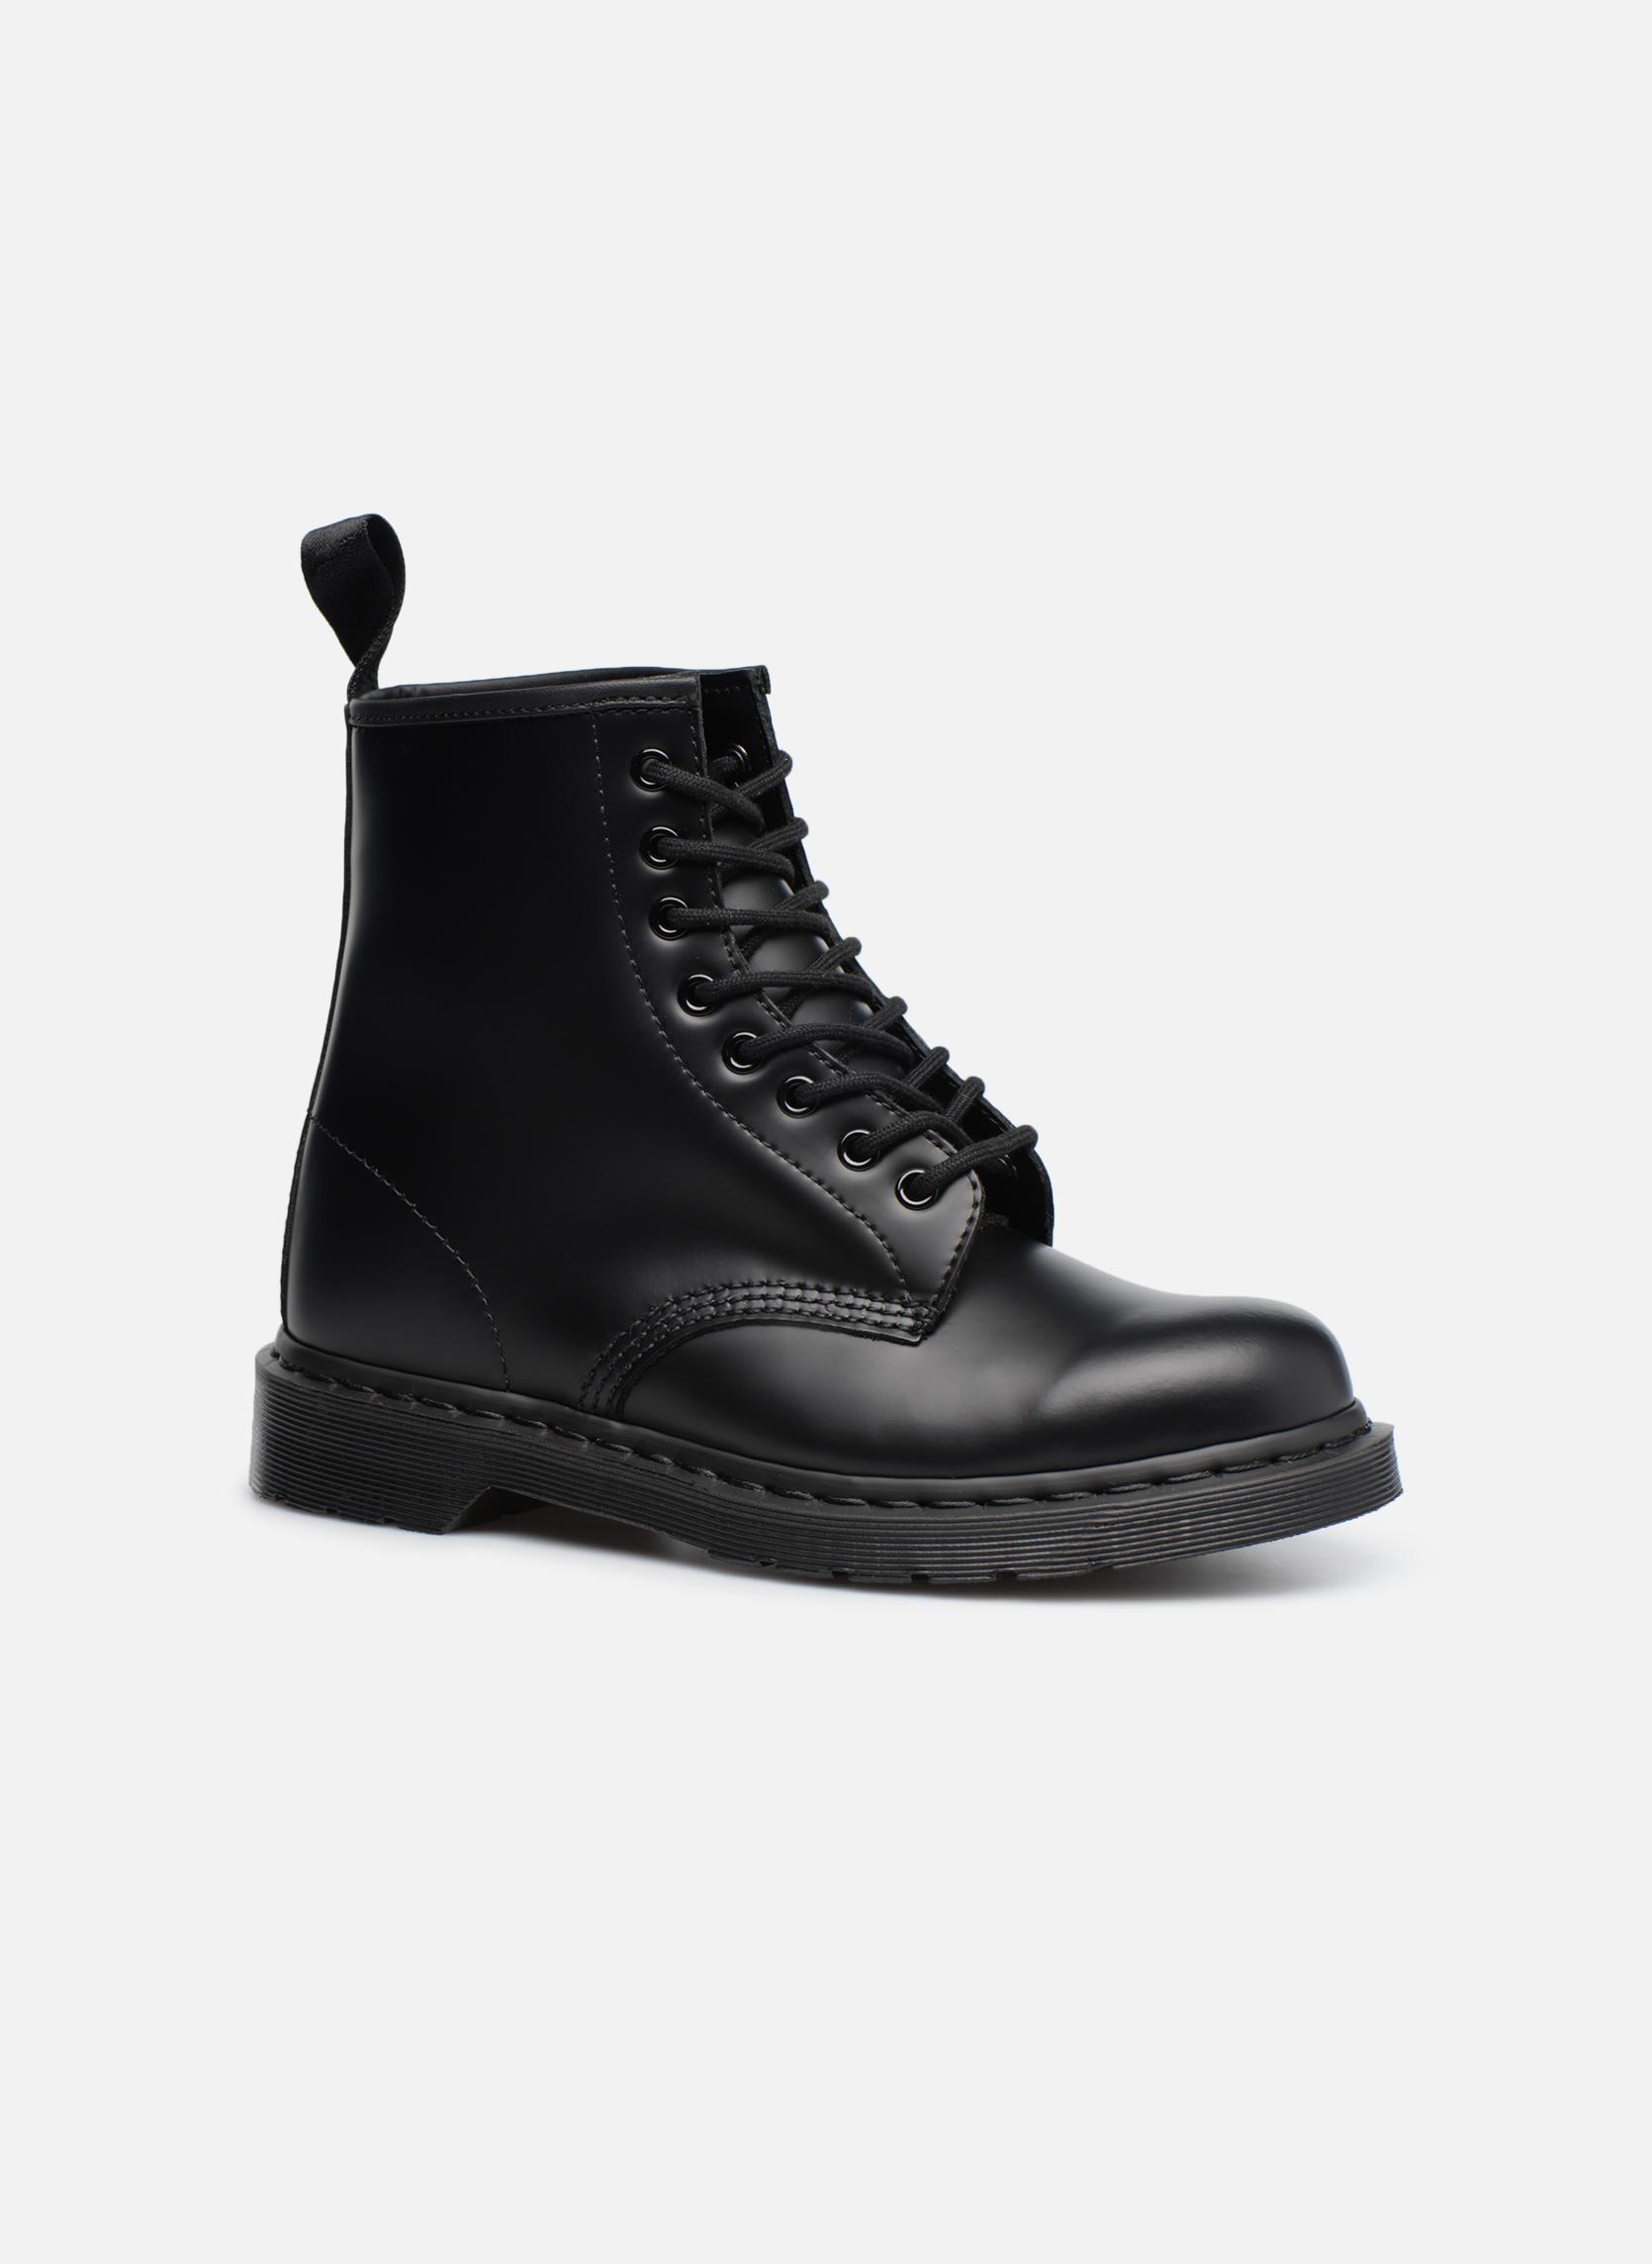 1460 MONO Black Smooth